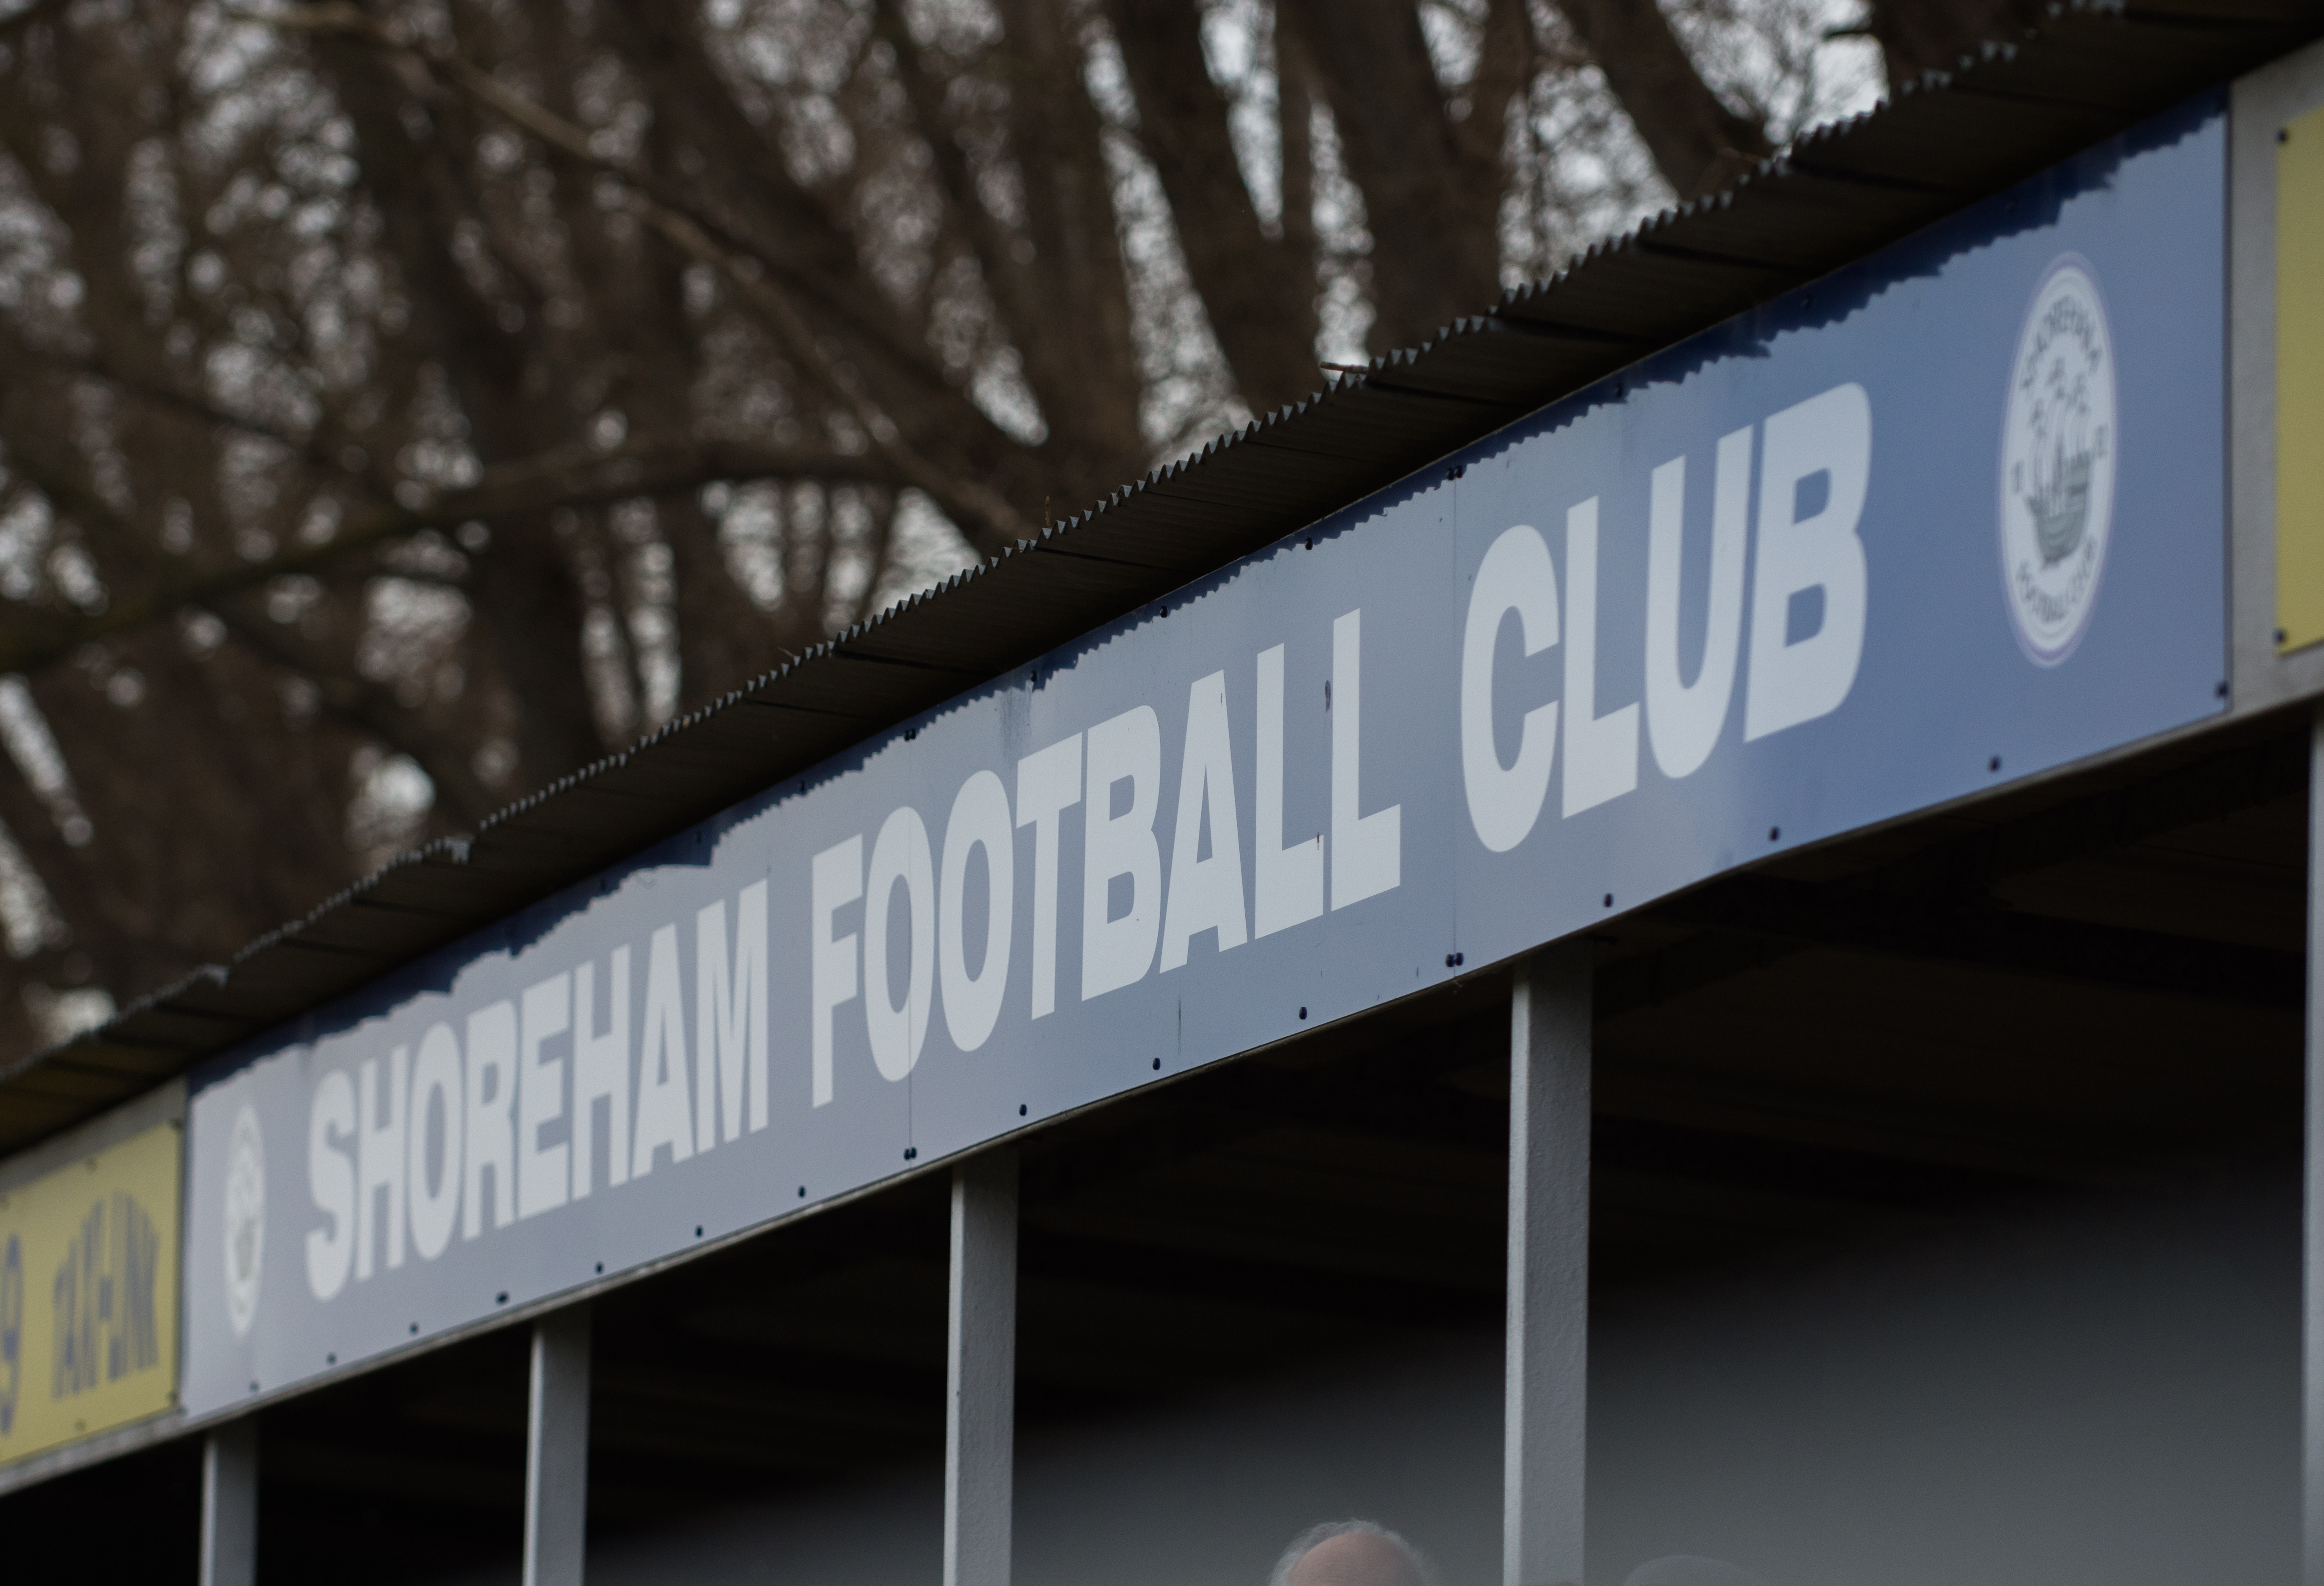 Shoreham FC vs Faversham Town 16.12.17 25